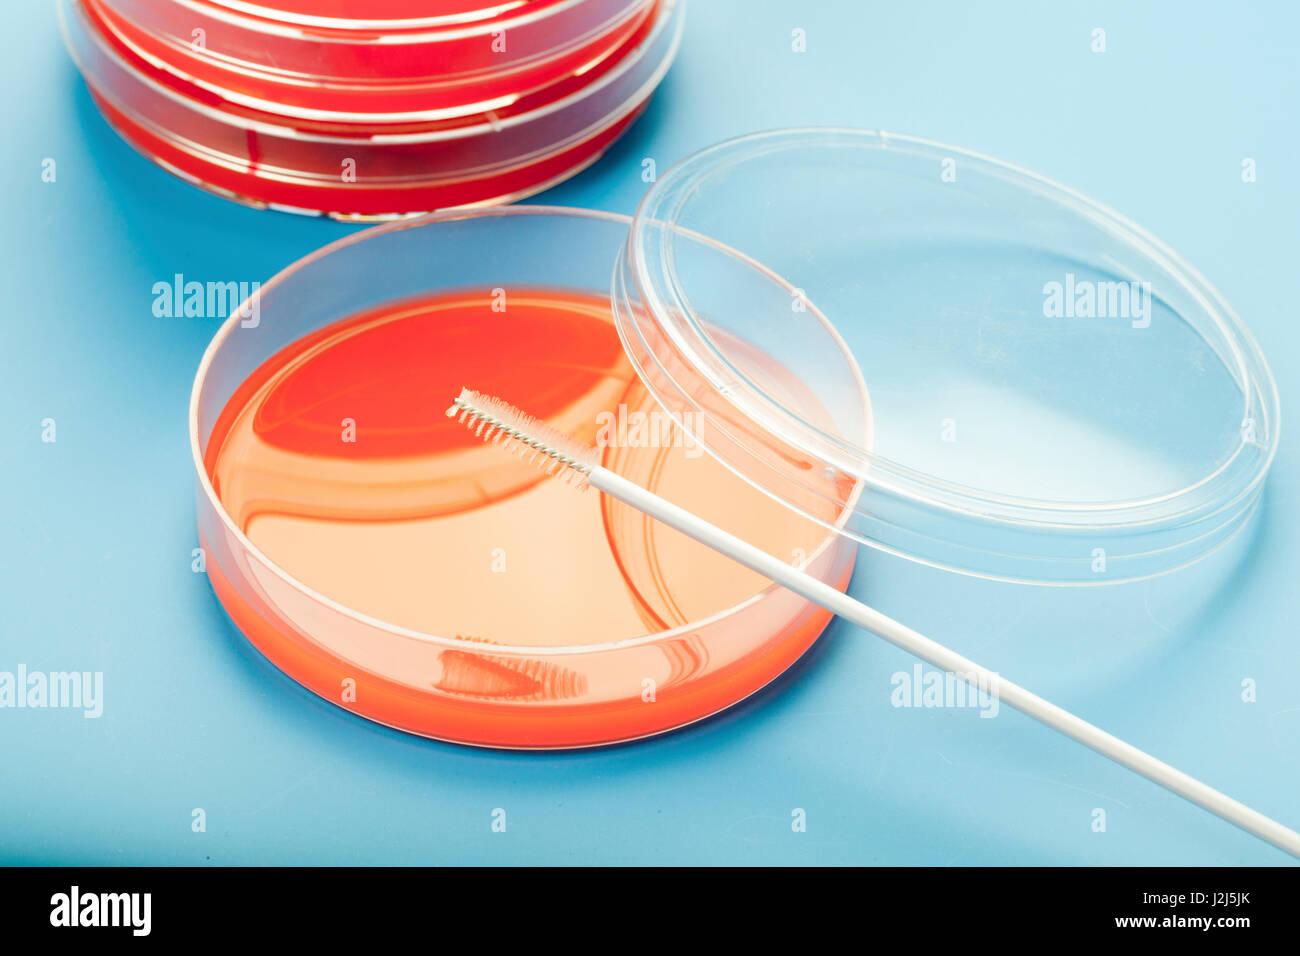 Petri dishes against blue background. - Stock Image